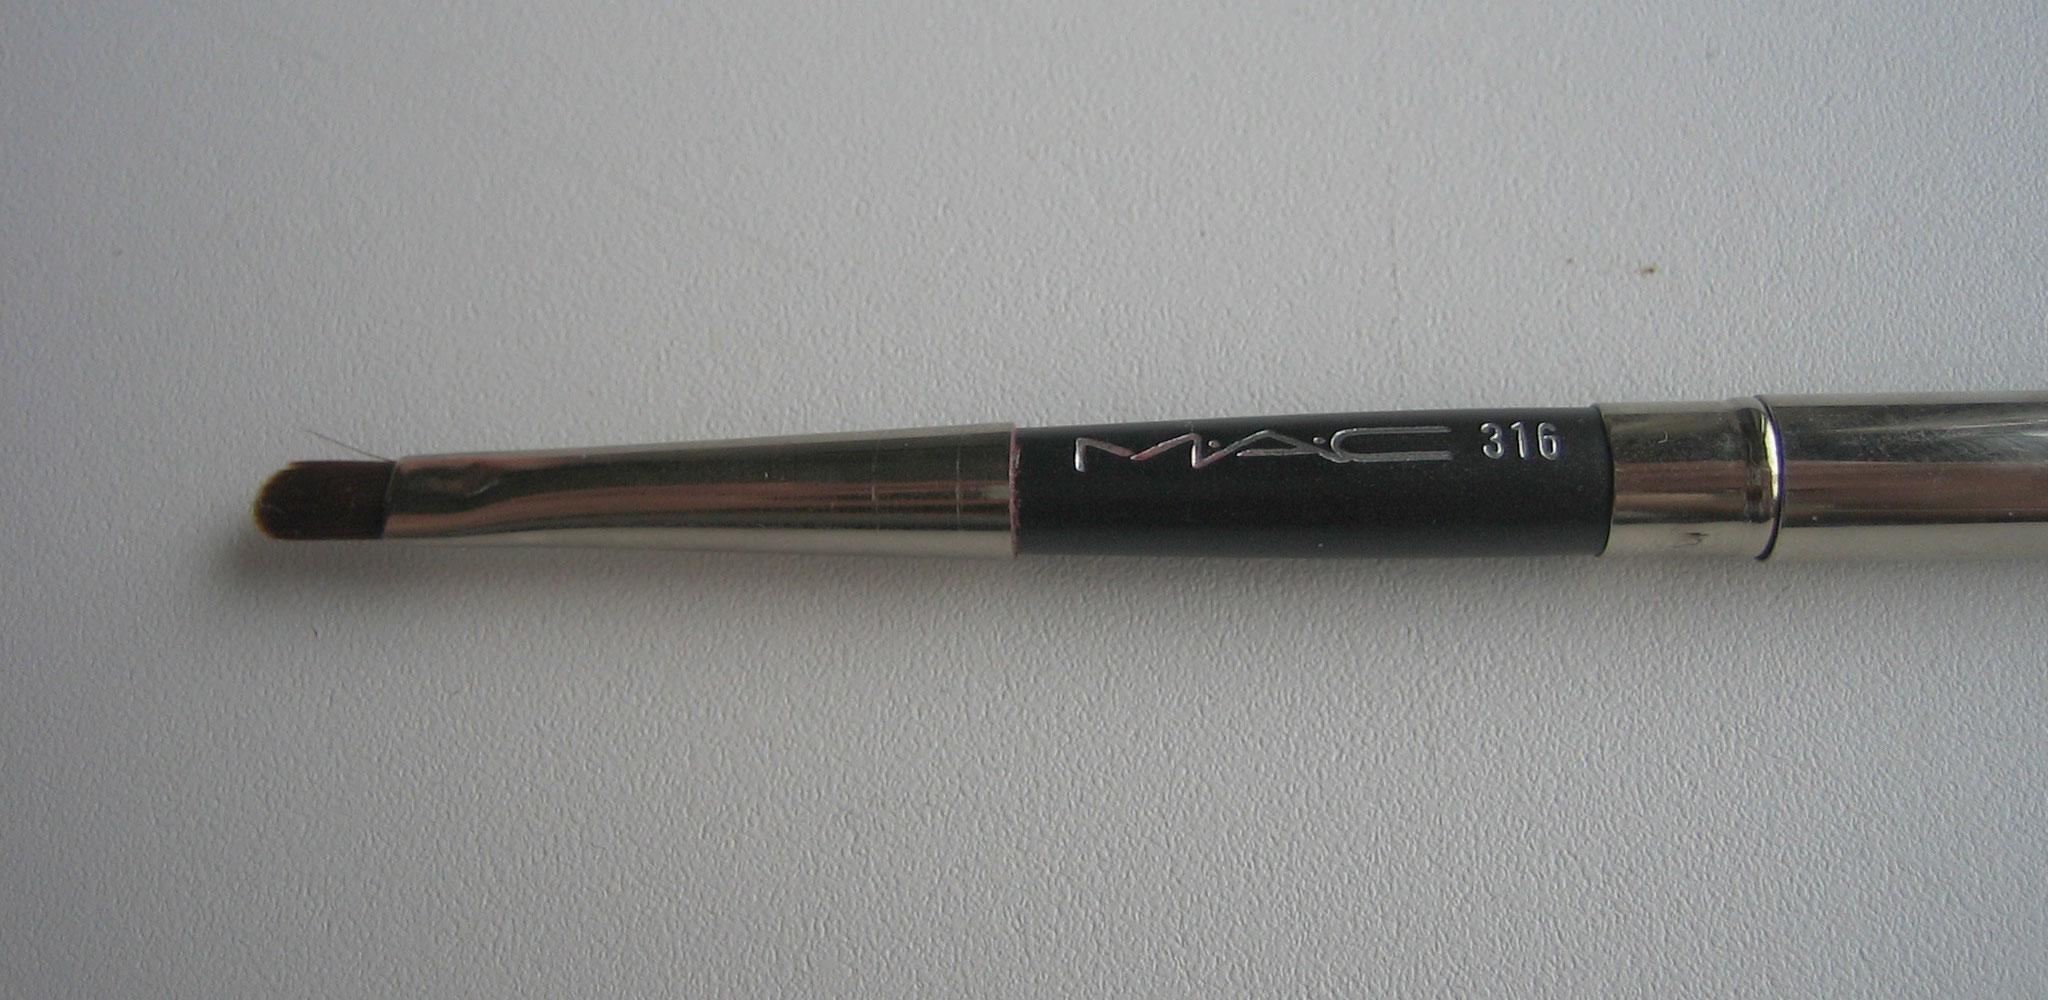 mac316